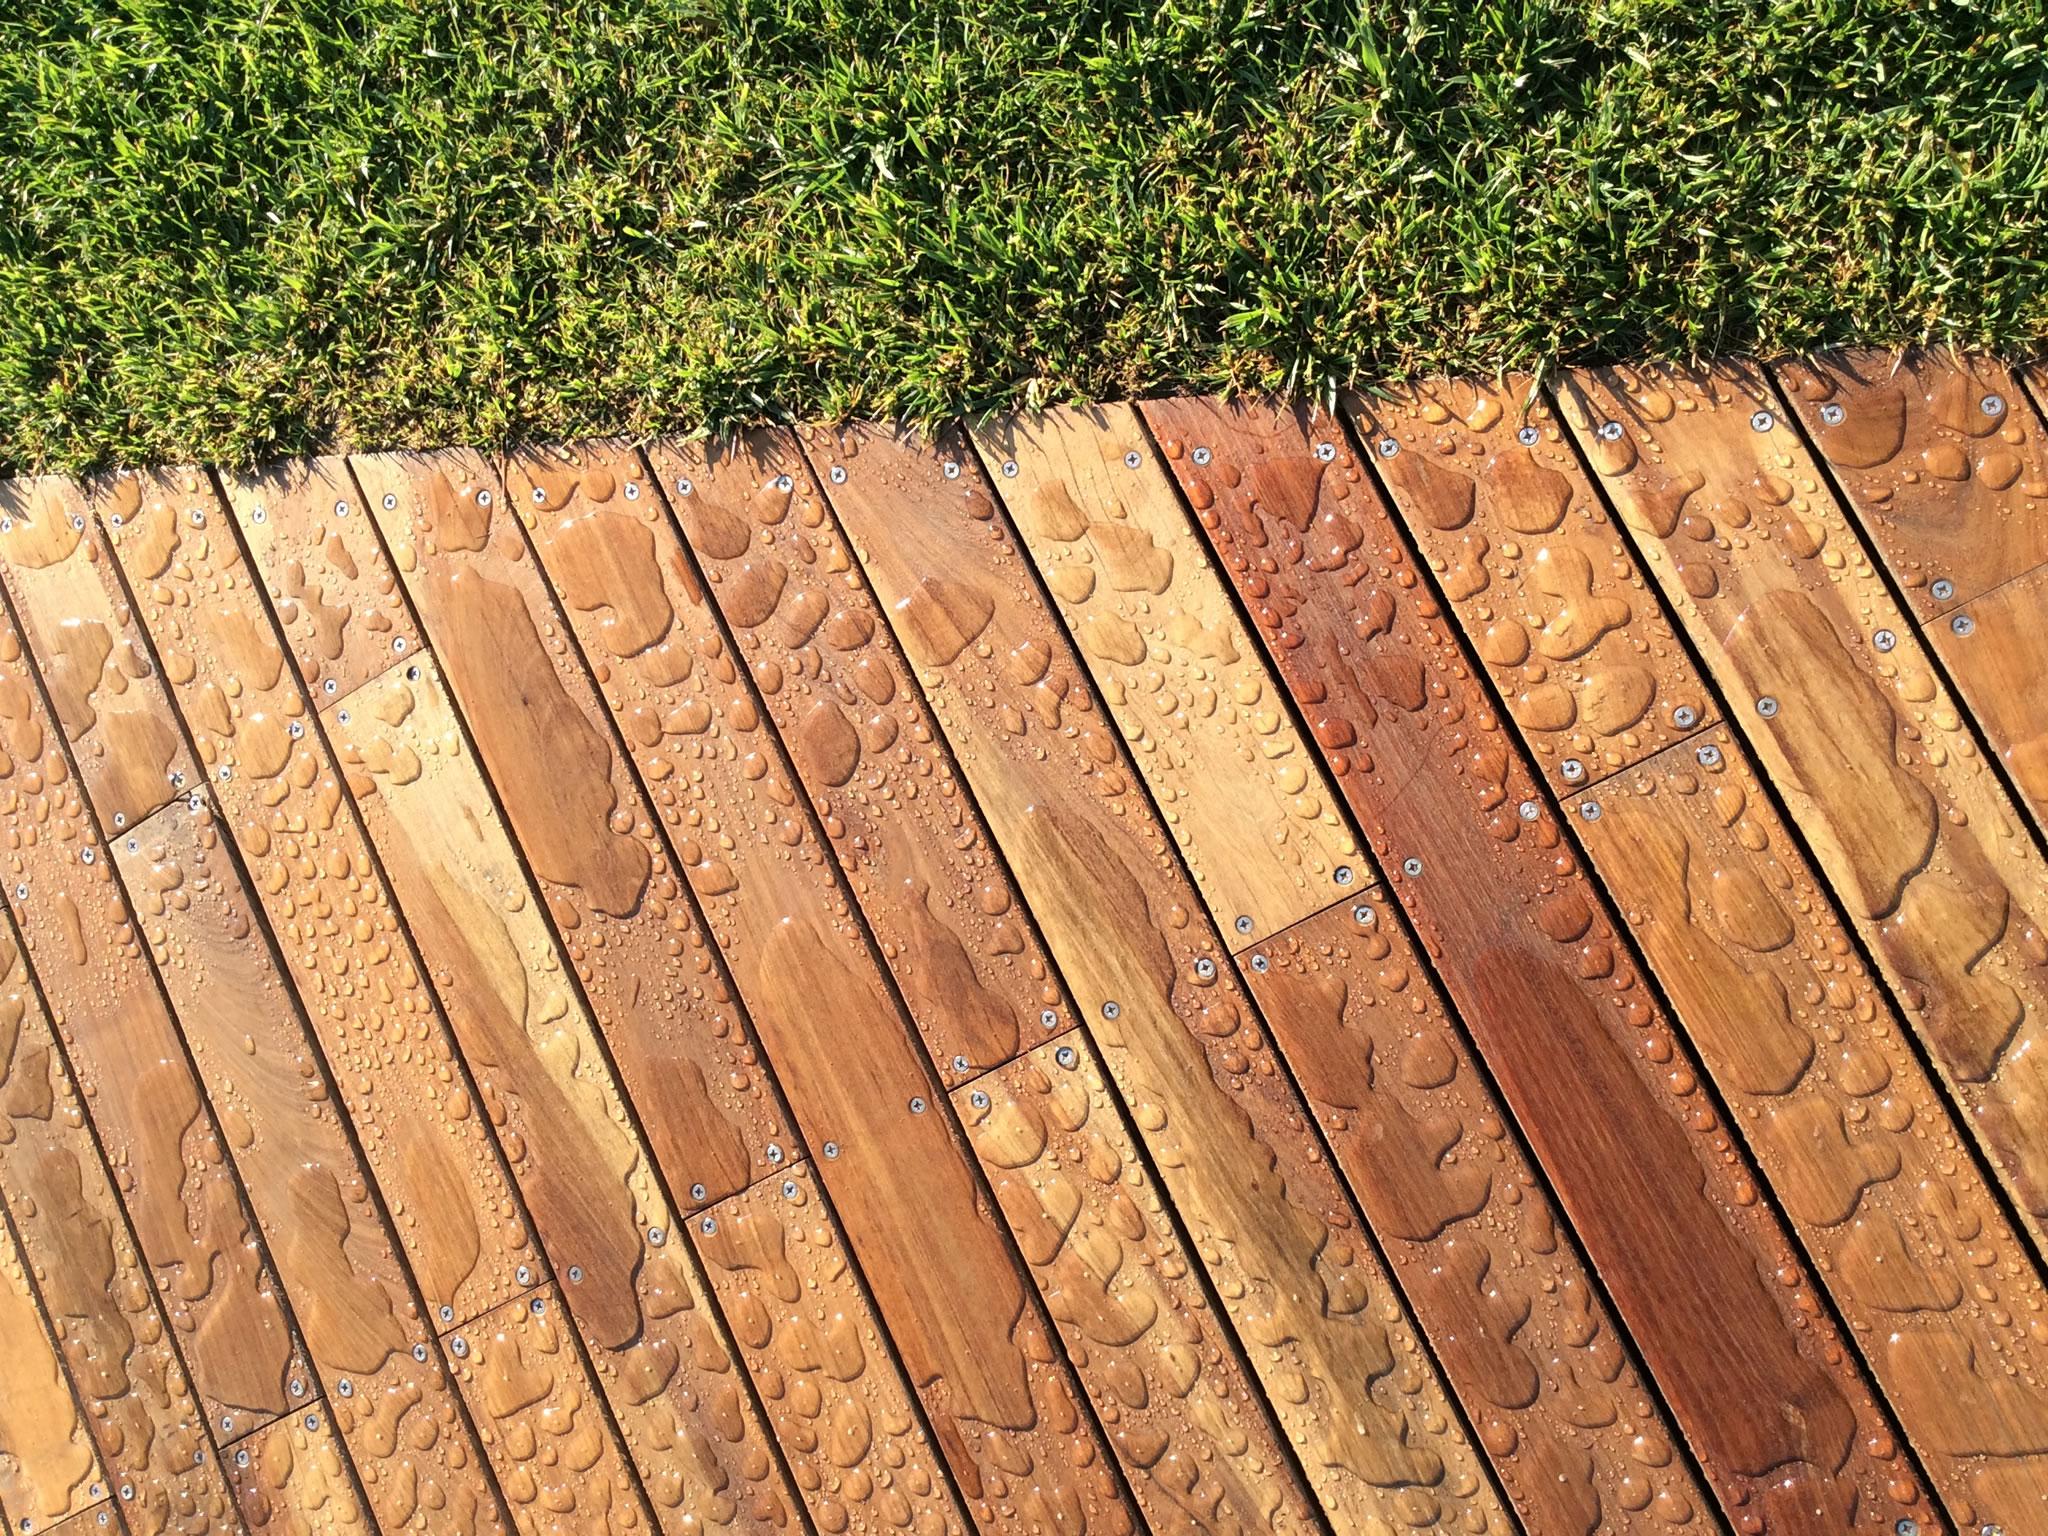 Pavimenti per esterni terenzi parquet pavimenti in for Pavimenti per esterni in legno